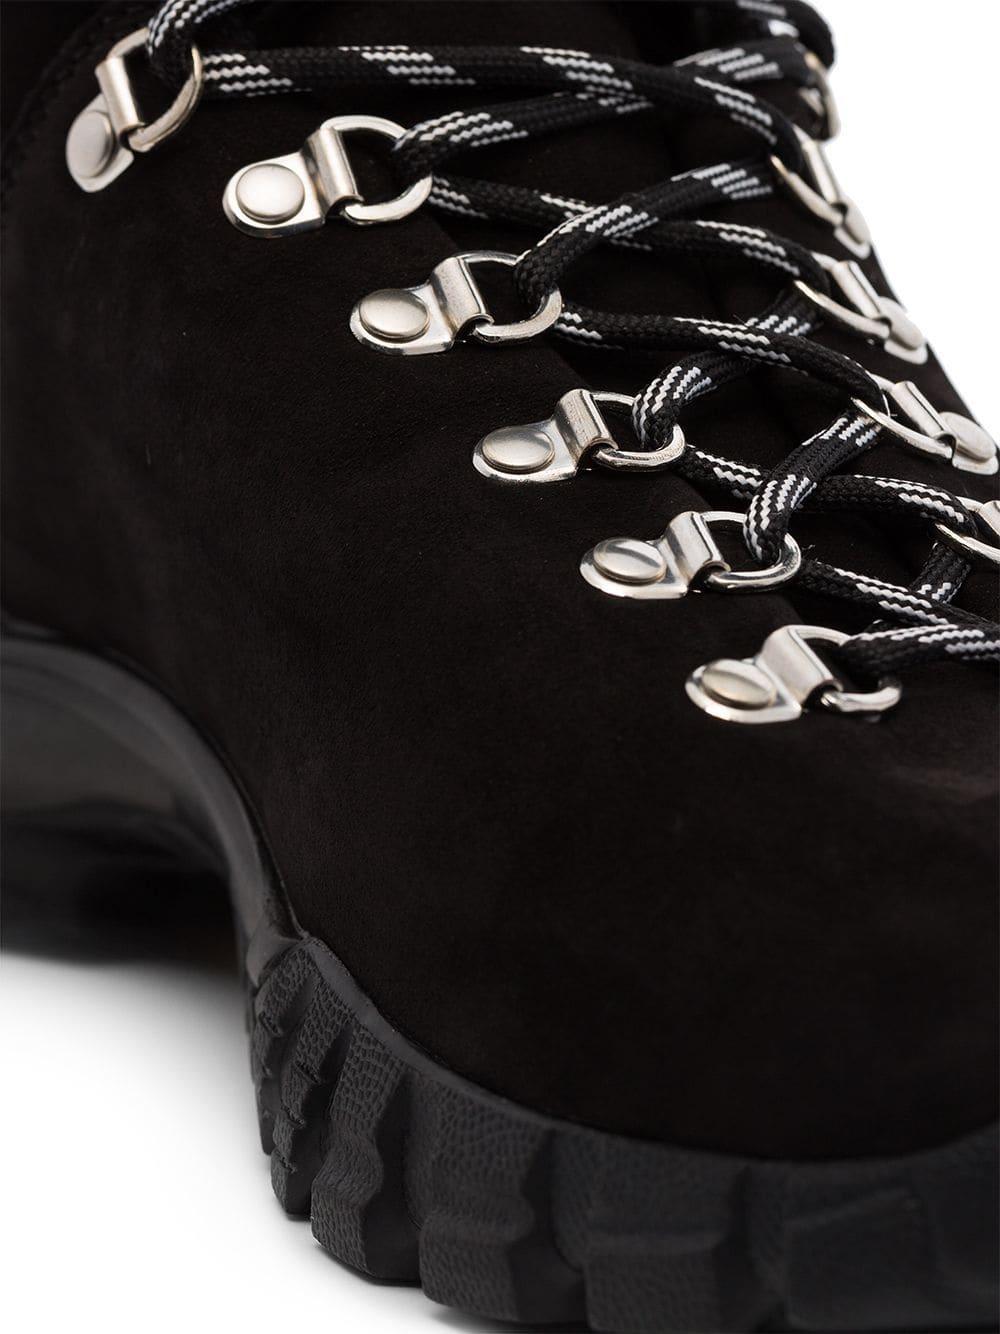 Botas de montaña Maser Diemme de Ante de color Negro